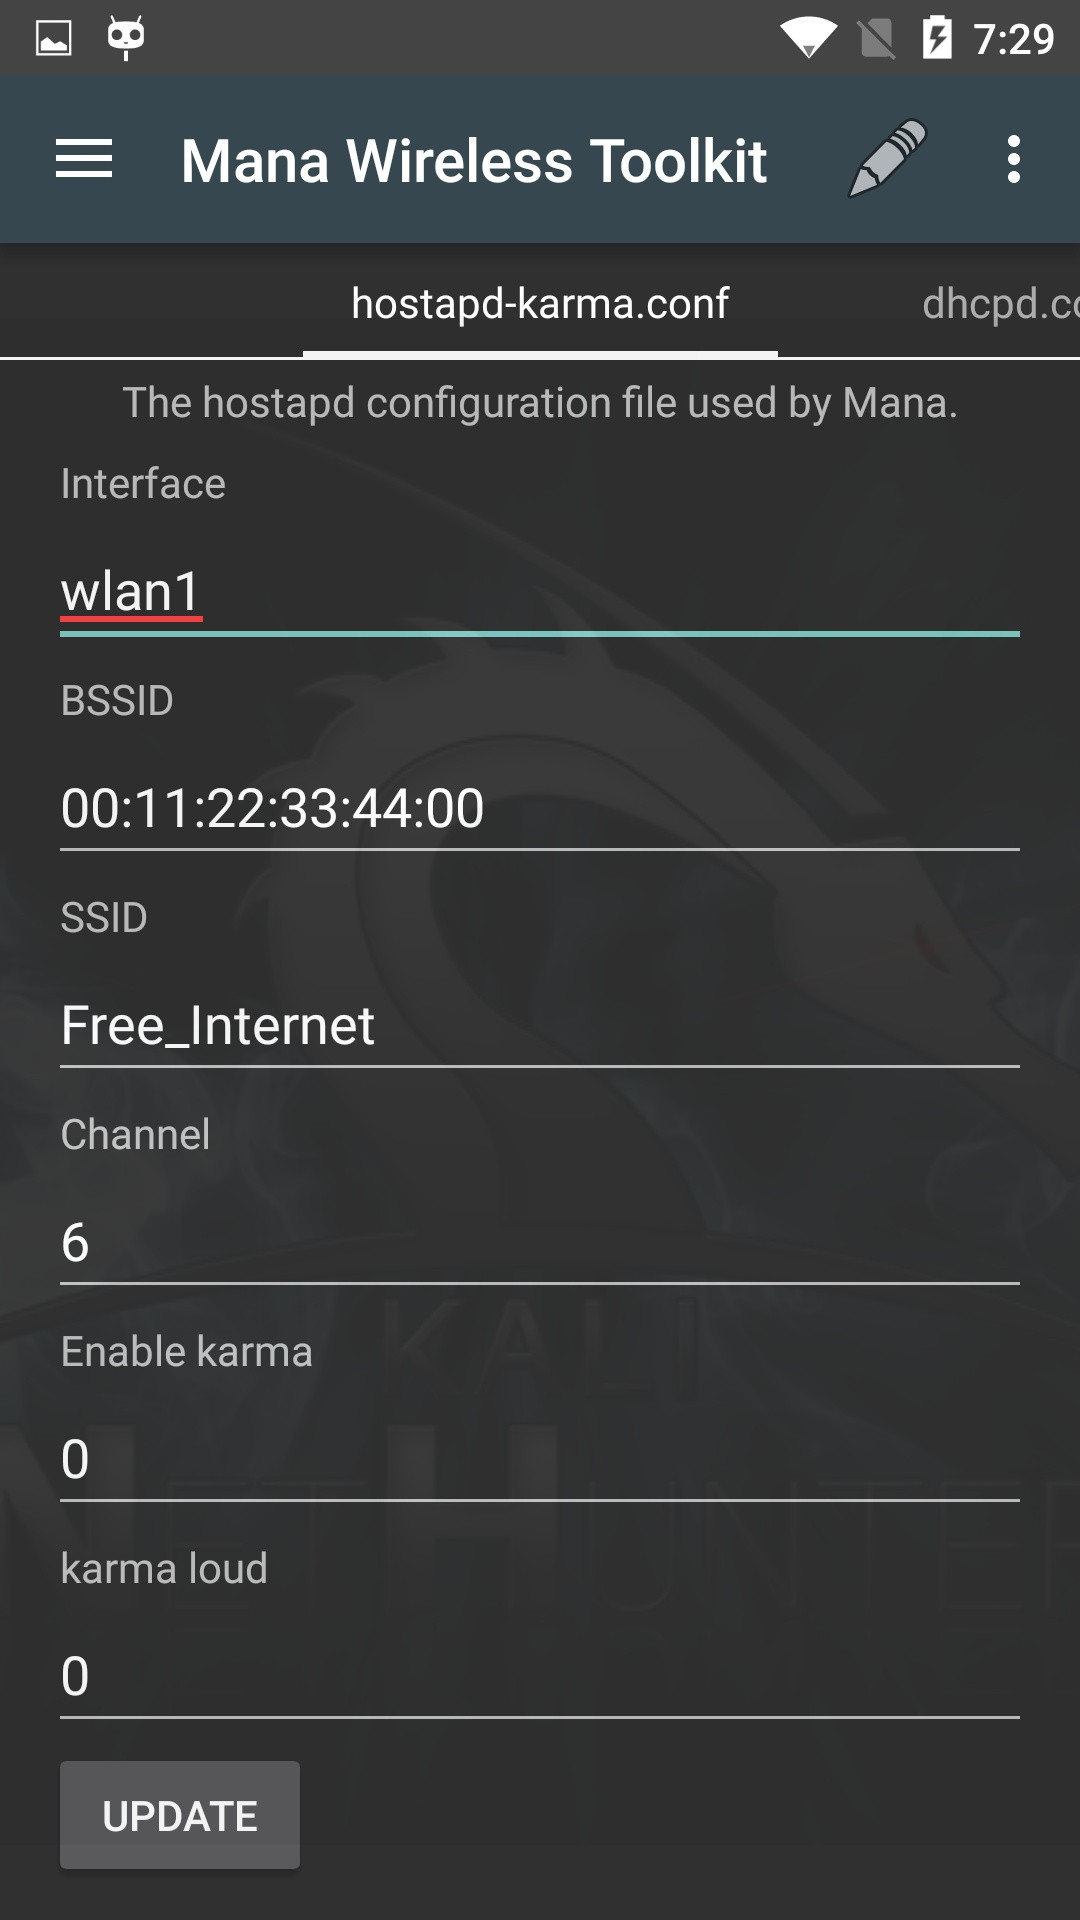 Kali Linux NetHunter 3 0 Android Mobile Penetration Testing